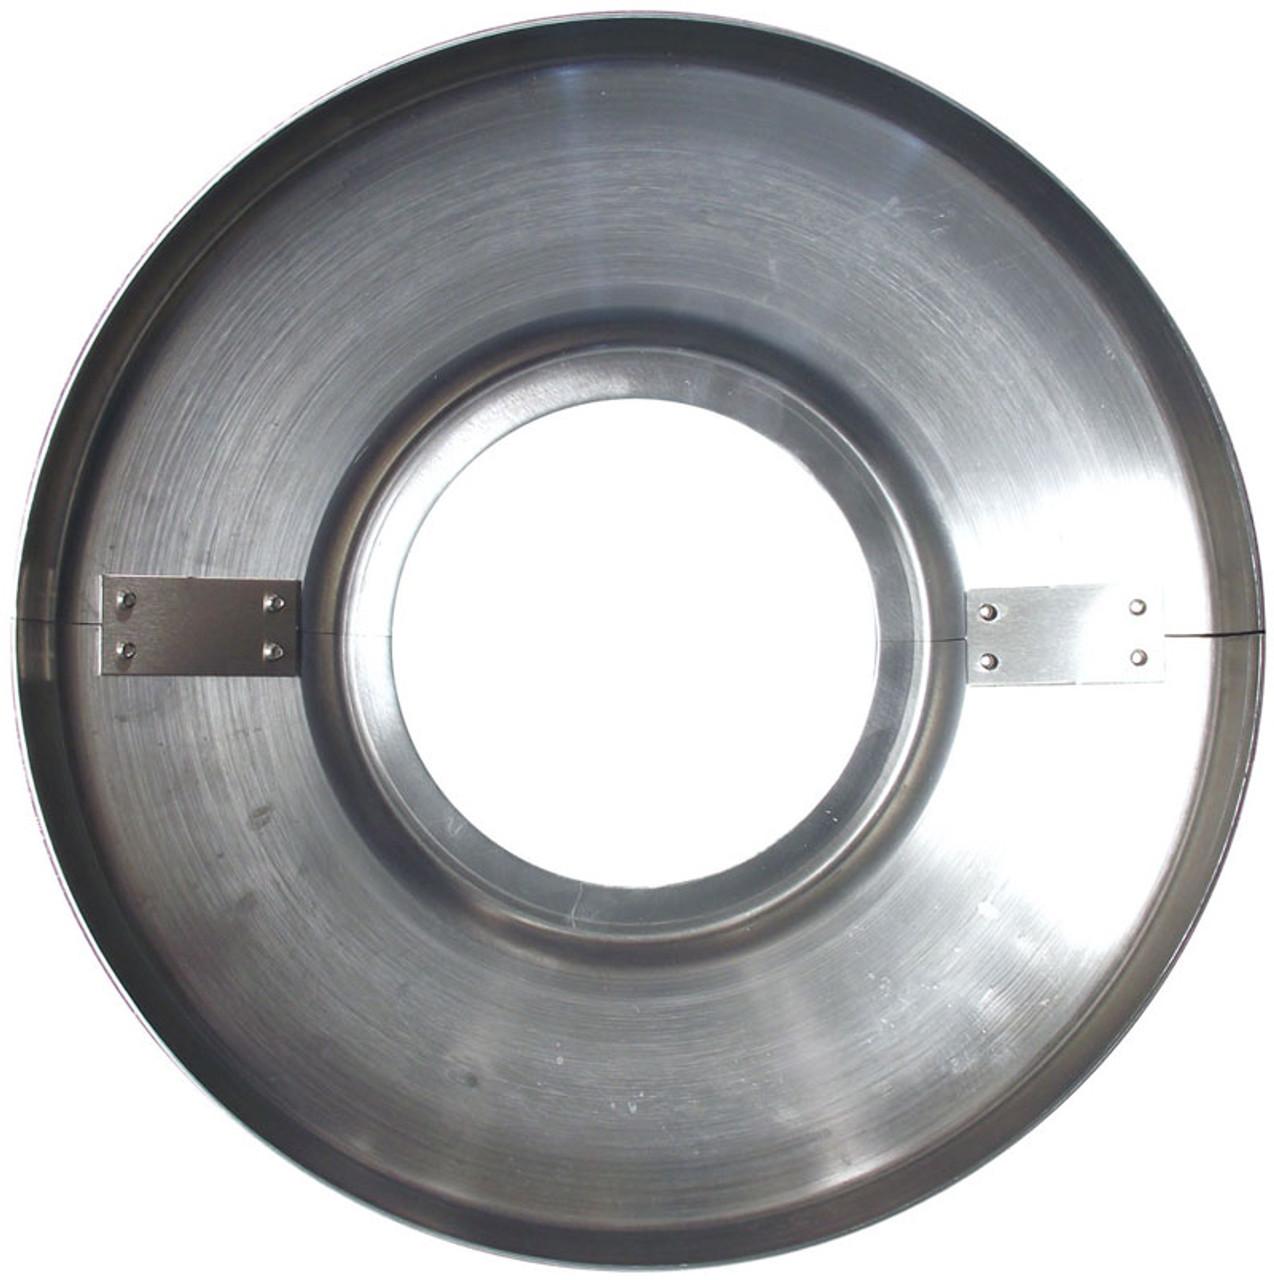 STYLE B Spun Aluminum Flag Pole Flash Collar